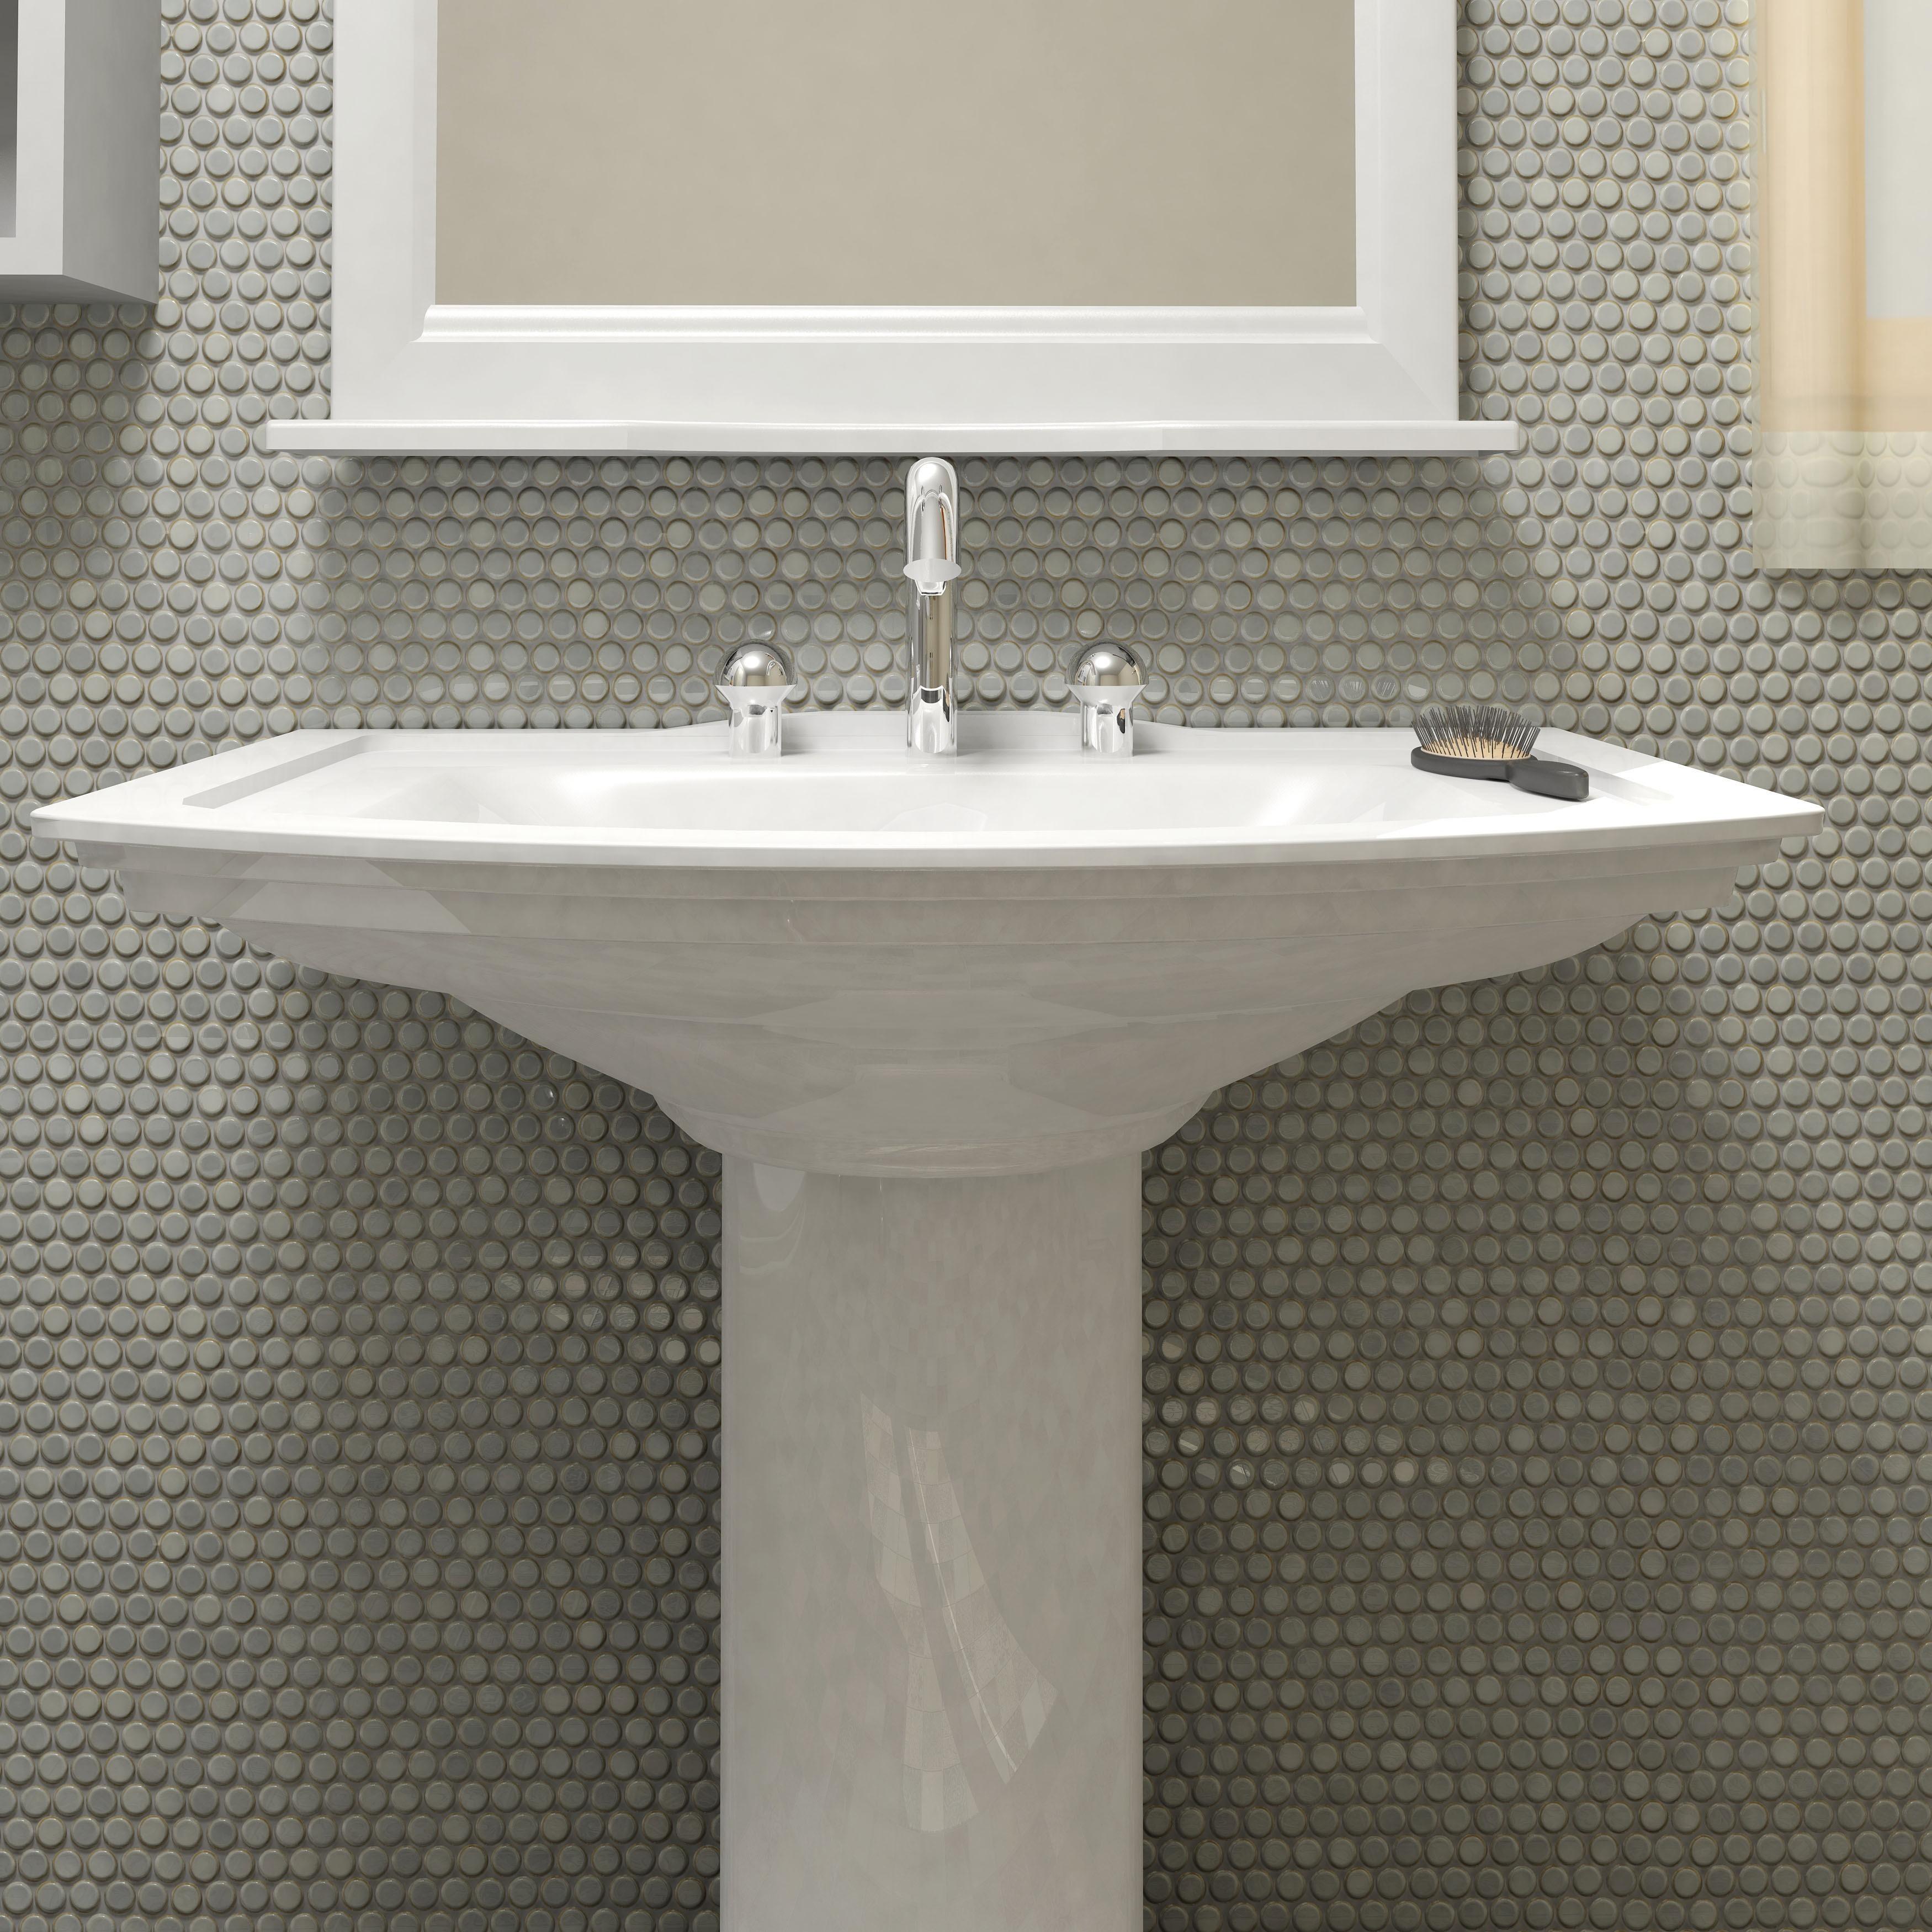 somertile 12x12 625 inch penny grey eye porcelain mosaic floor and wall tile 10 tiles 10 2 sqft